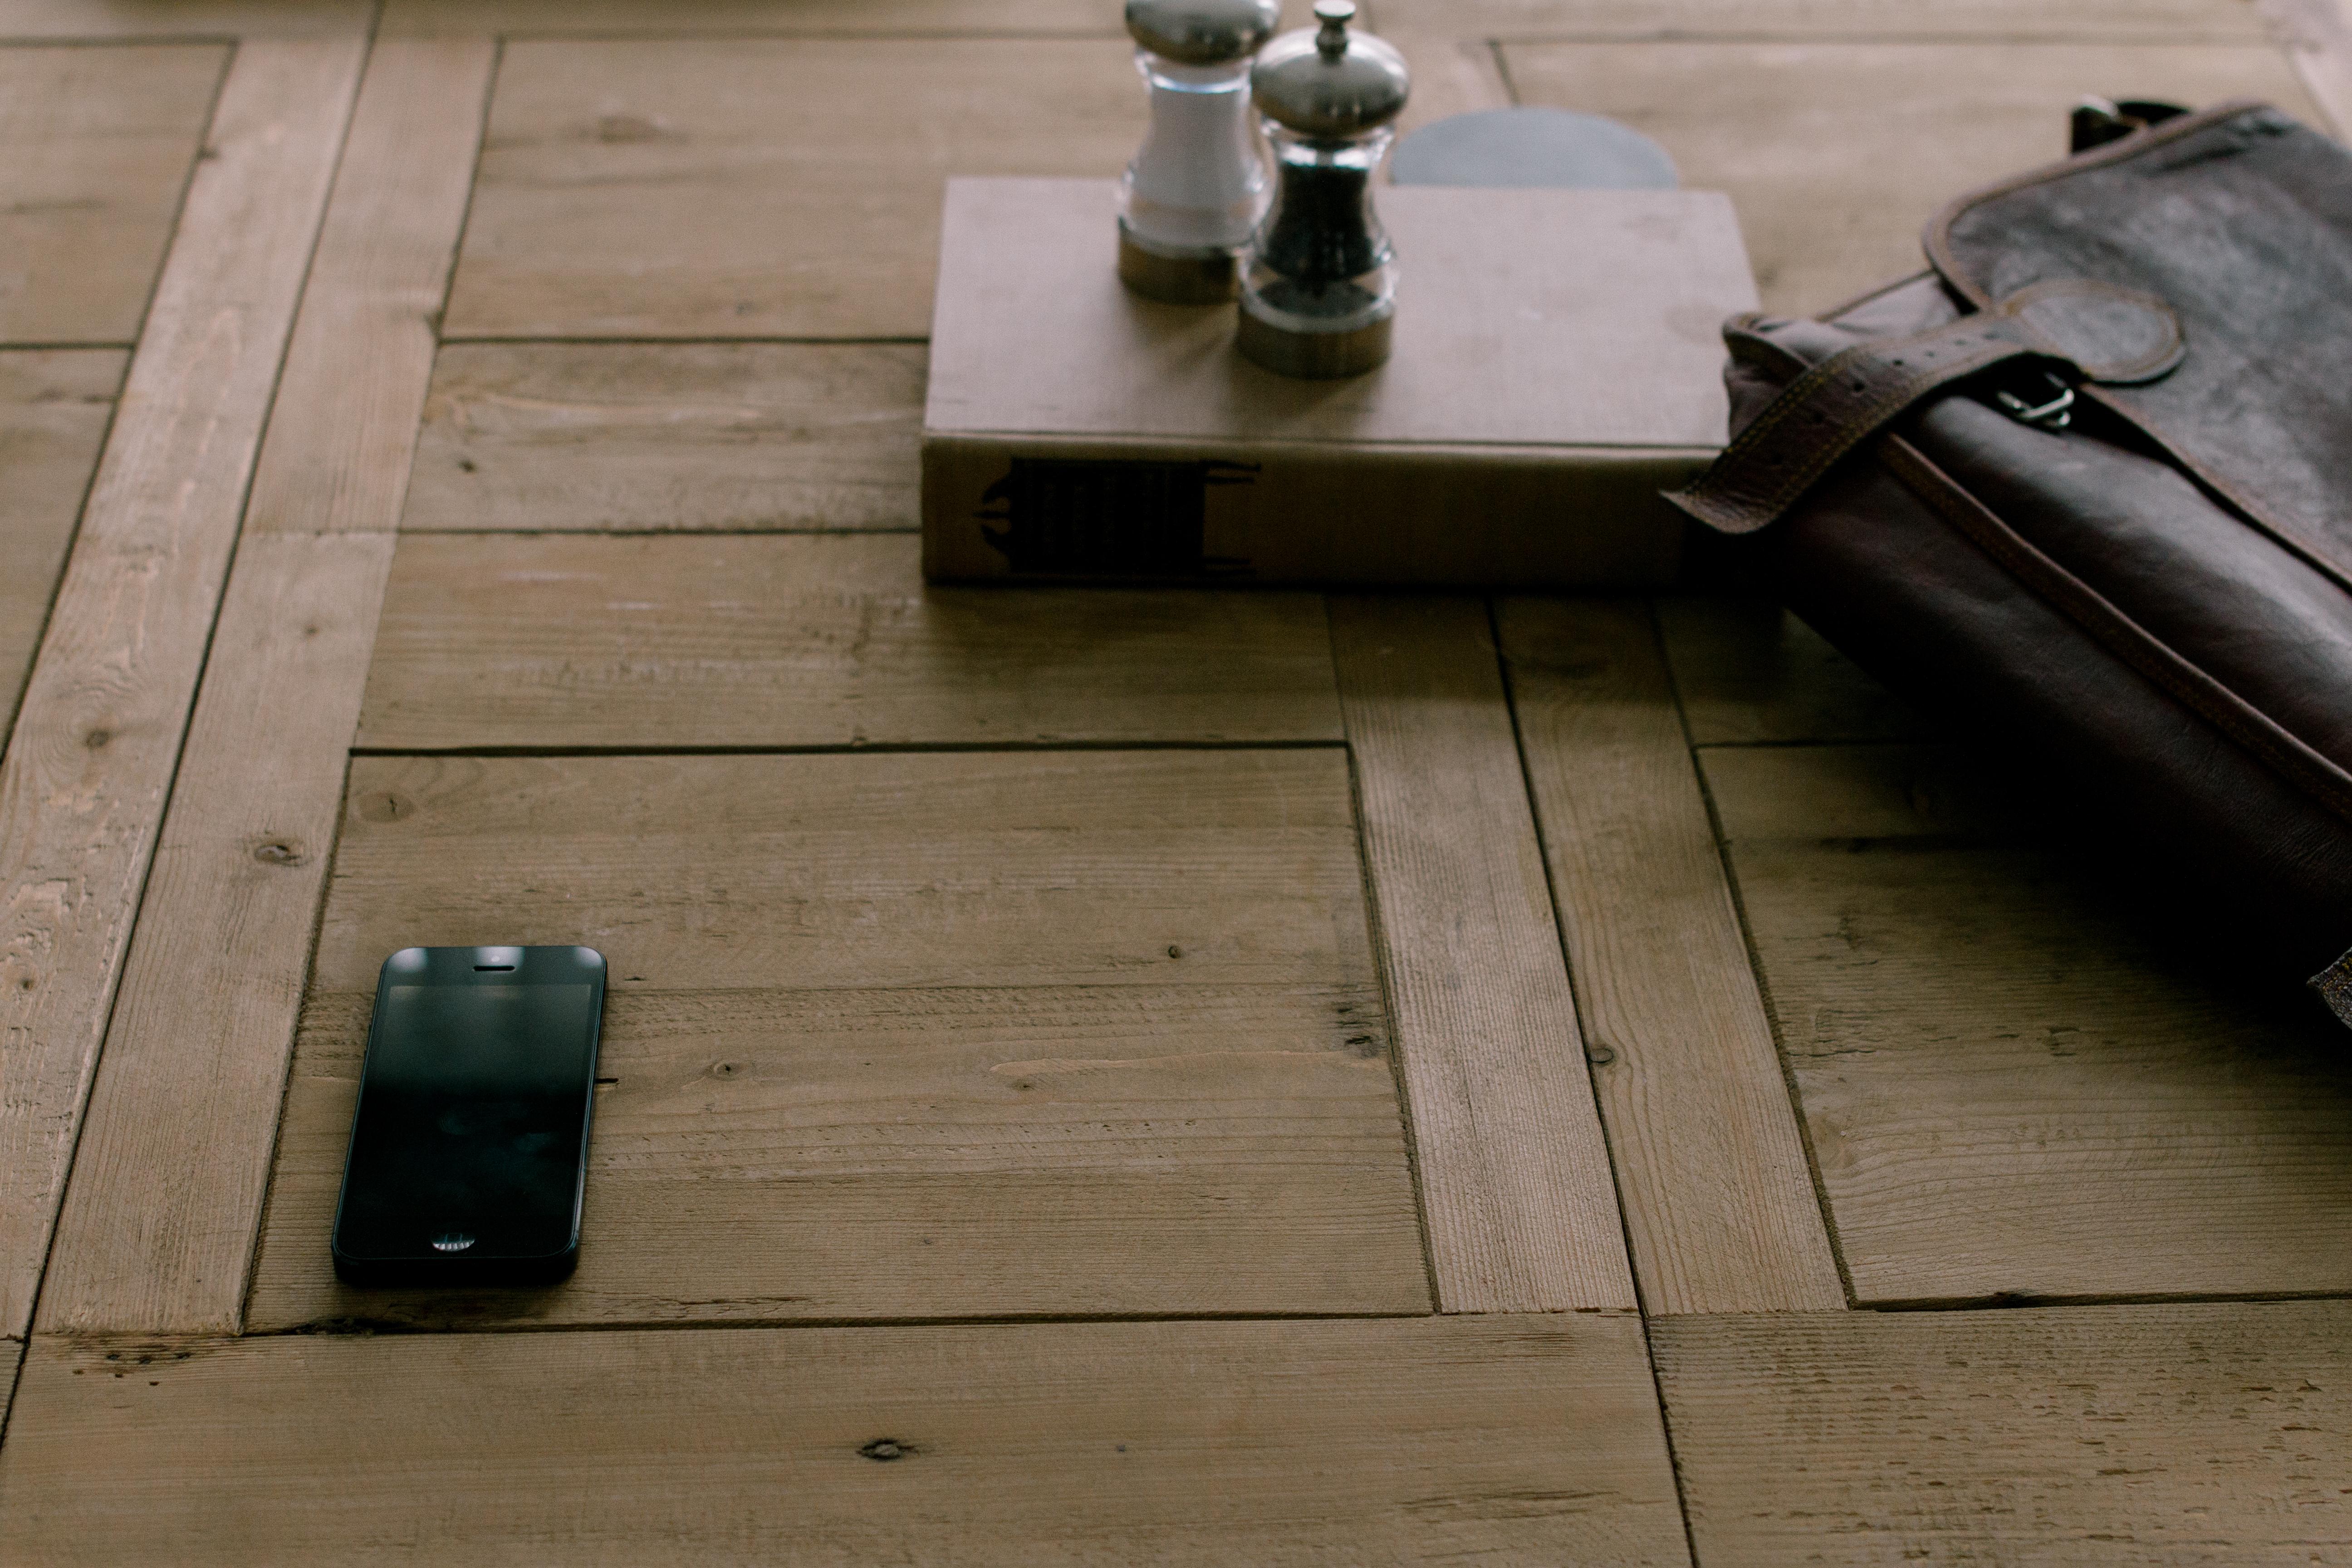 Iphone Table Book Wood Floor Pattern Phone Tile Furniture Publicdomain Background Stilllife Hardwood Satchel Saltandpeppershakers Brownsatchel